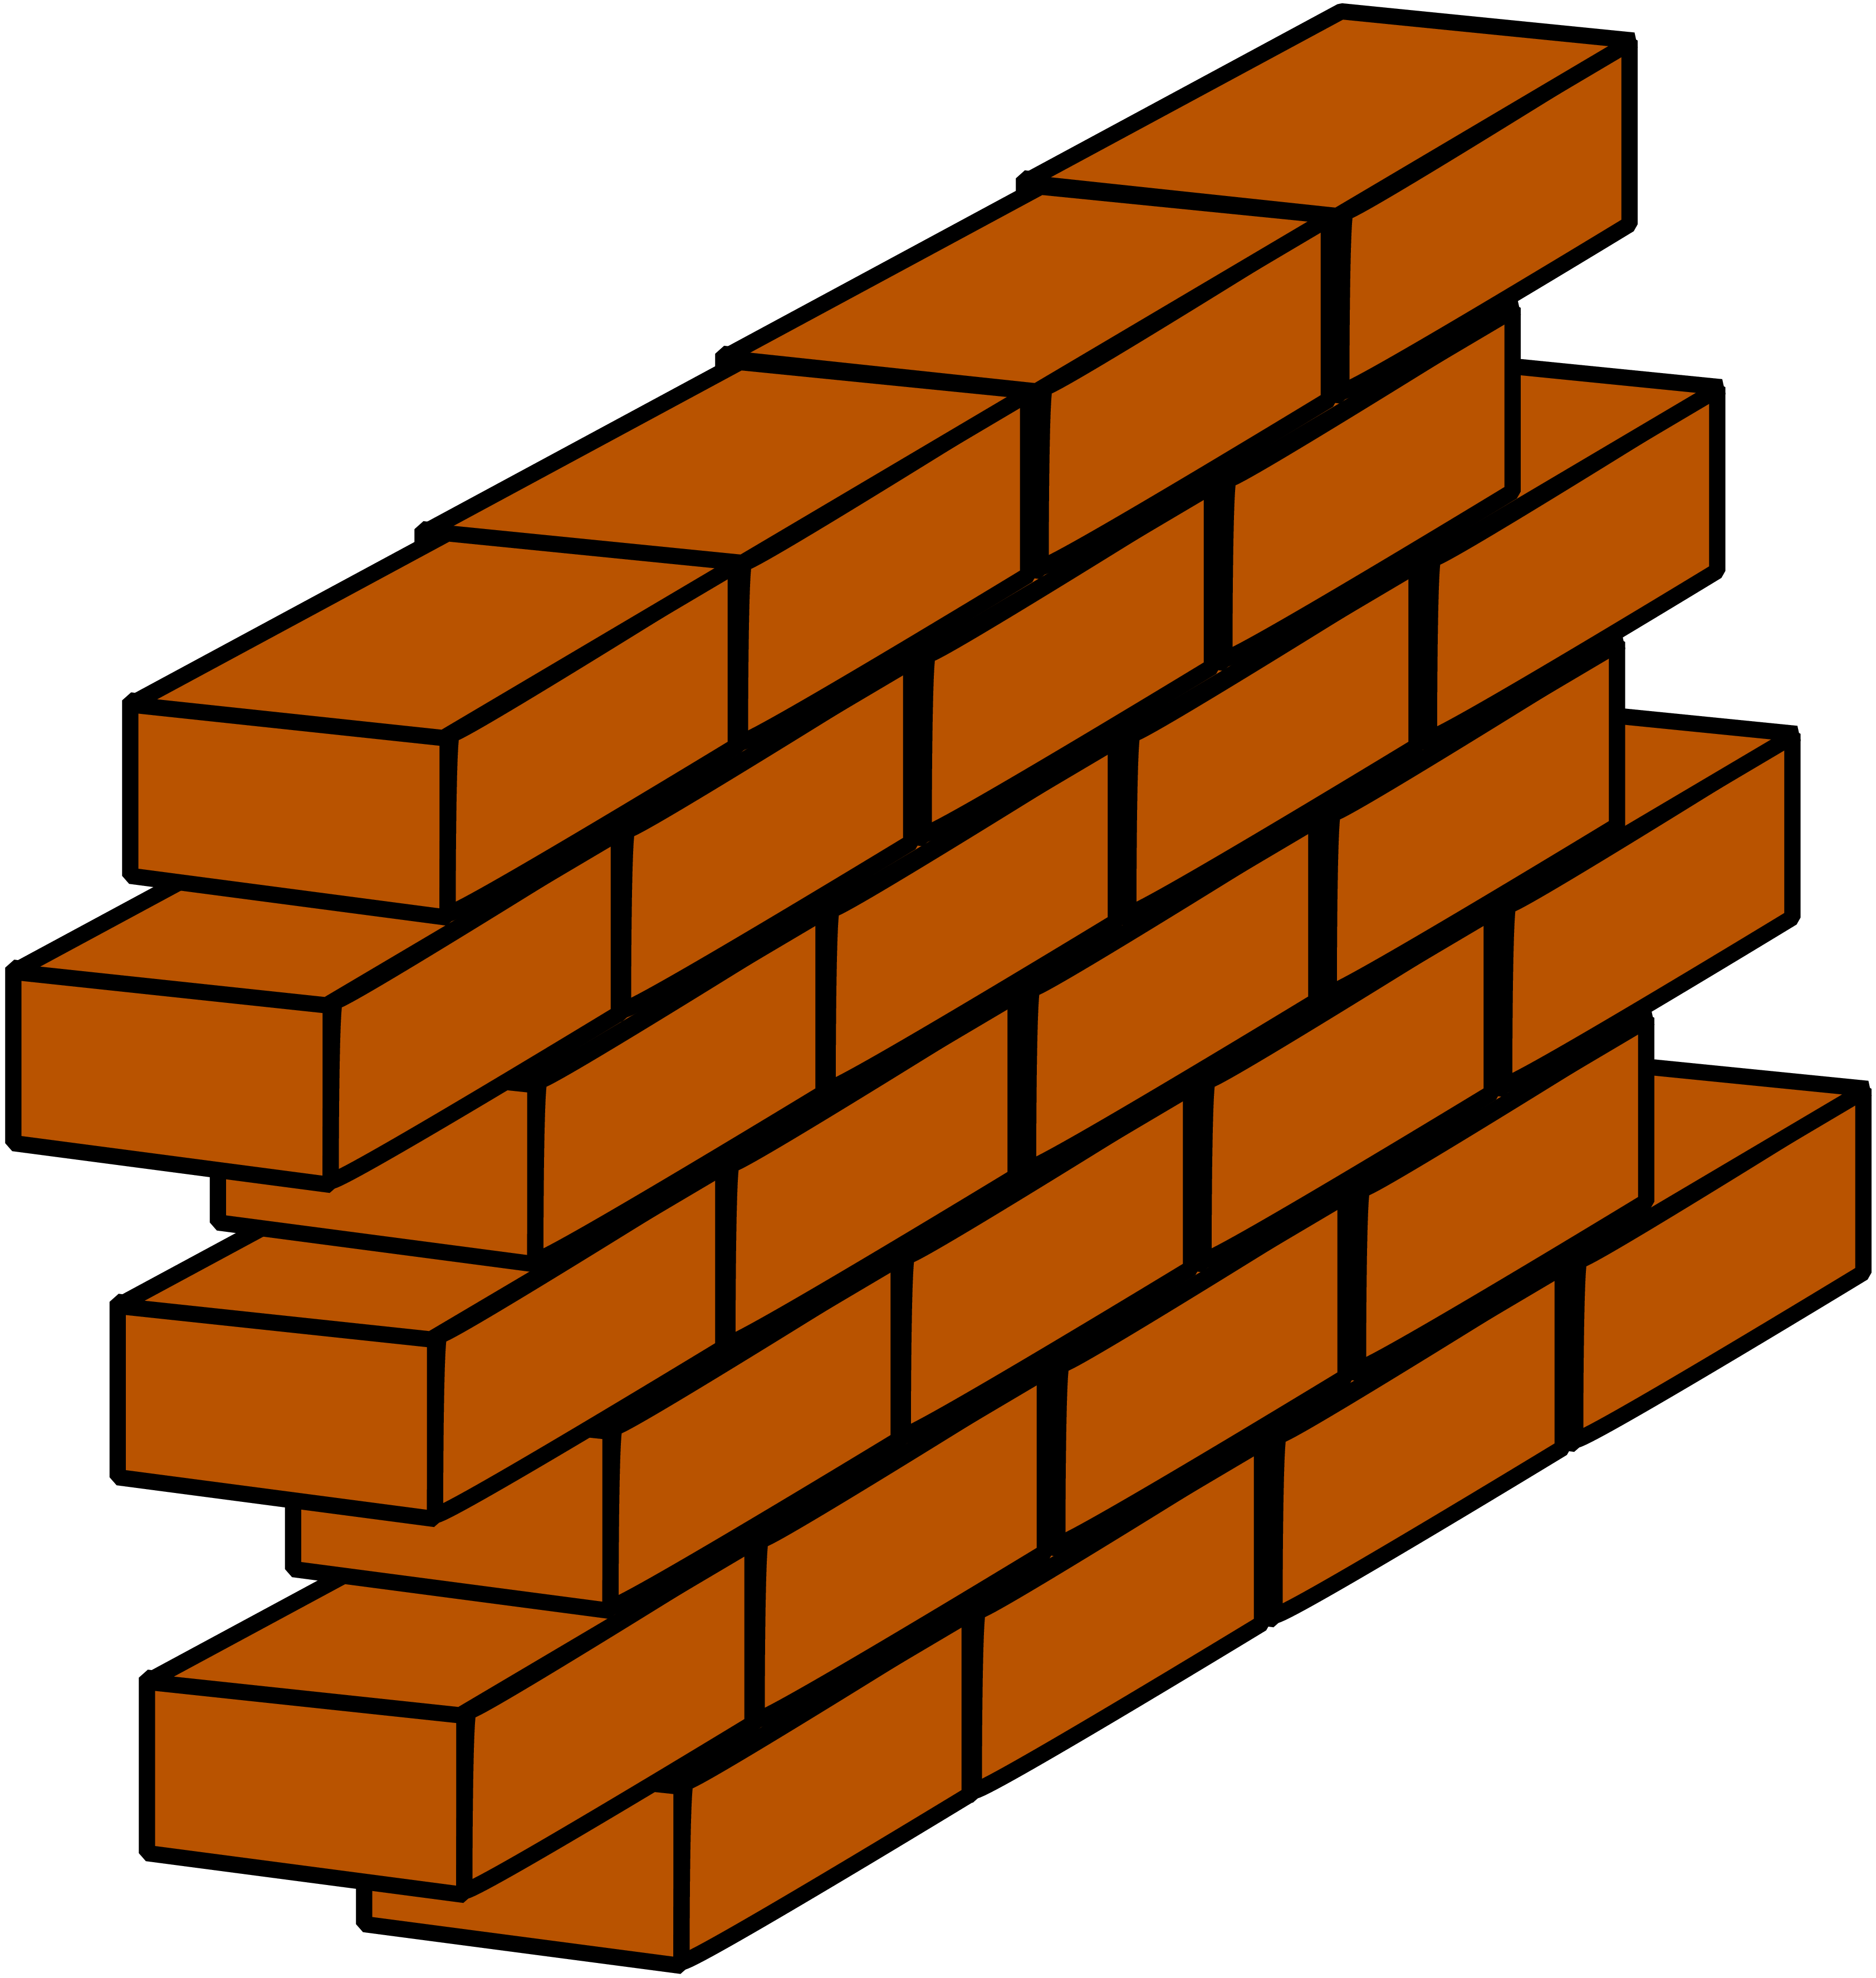 Brick Png image #39842